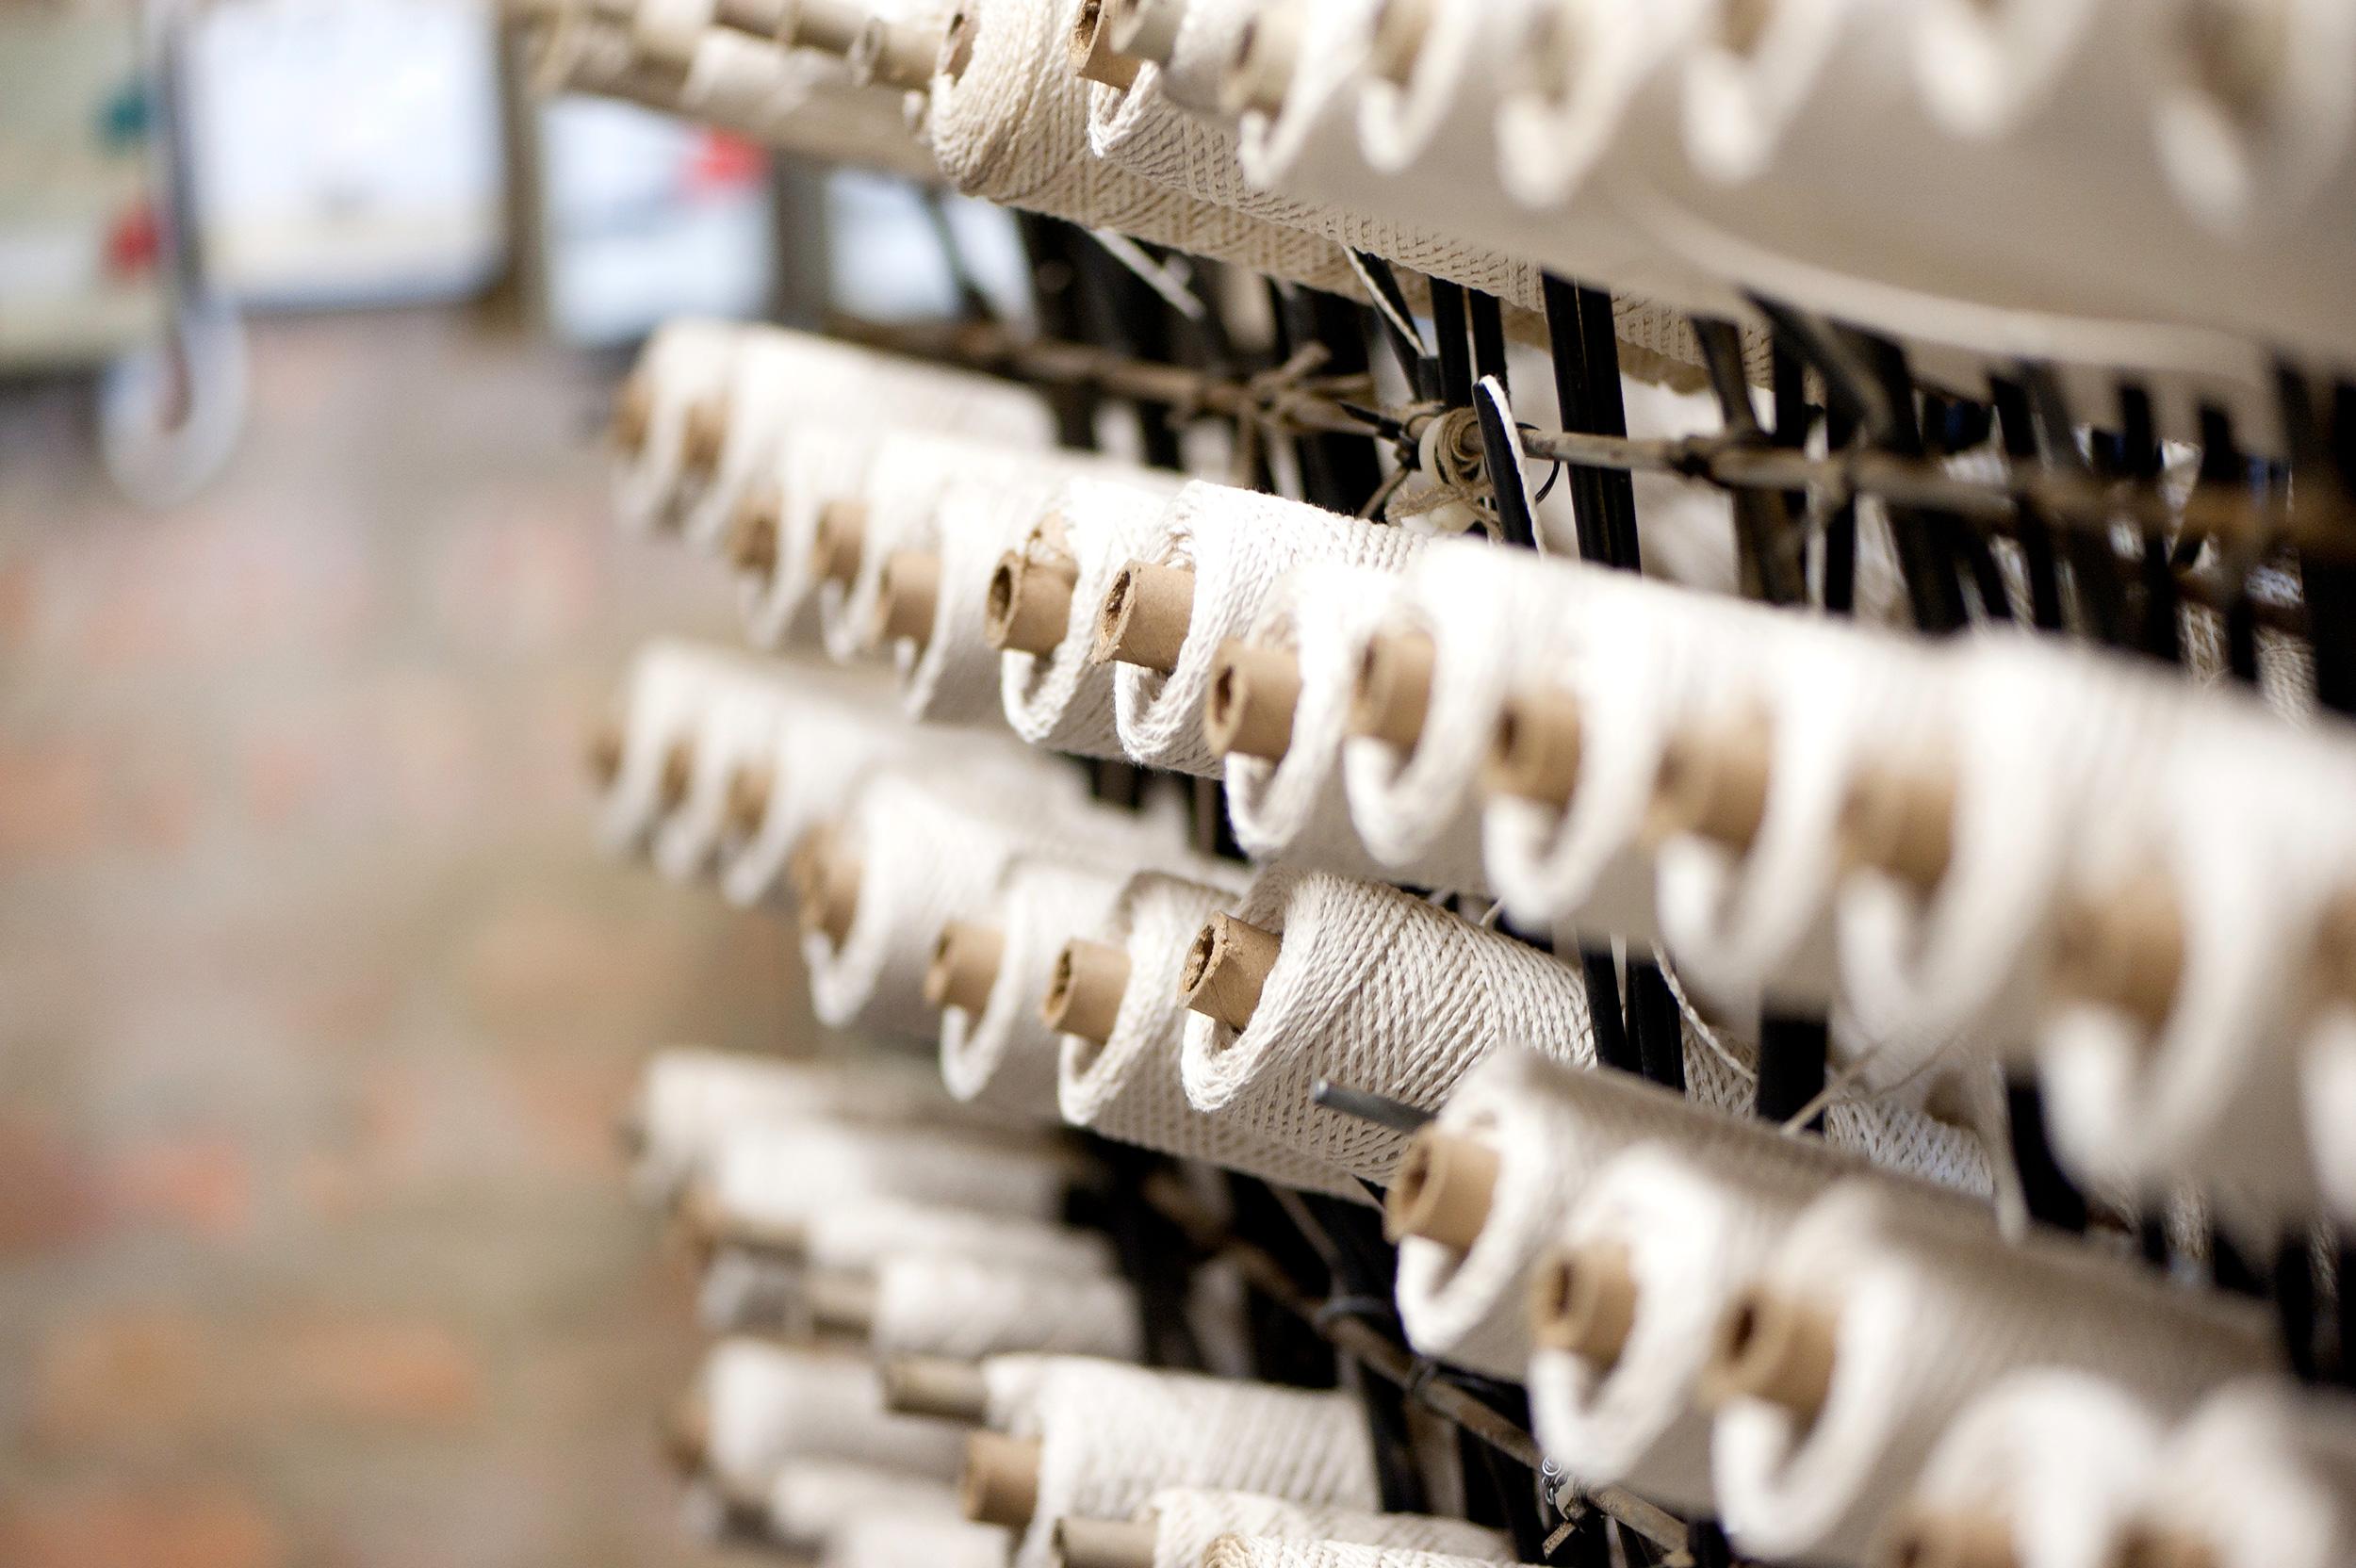 kapula-handmade-soy-candles-wick-rolls.jpg